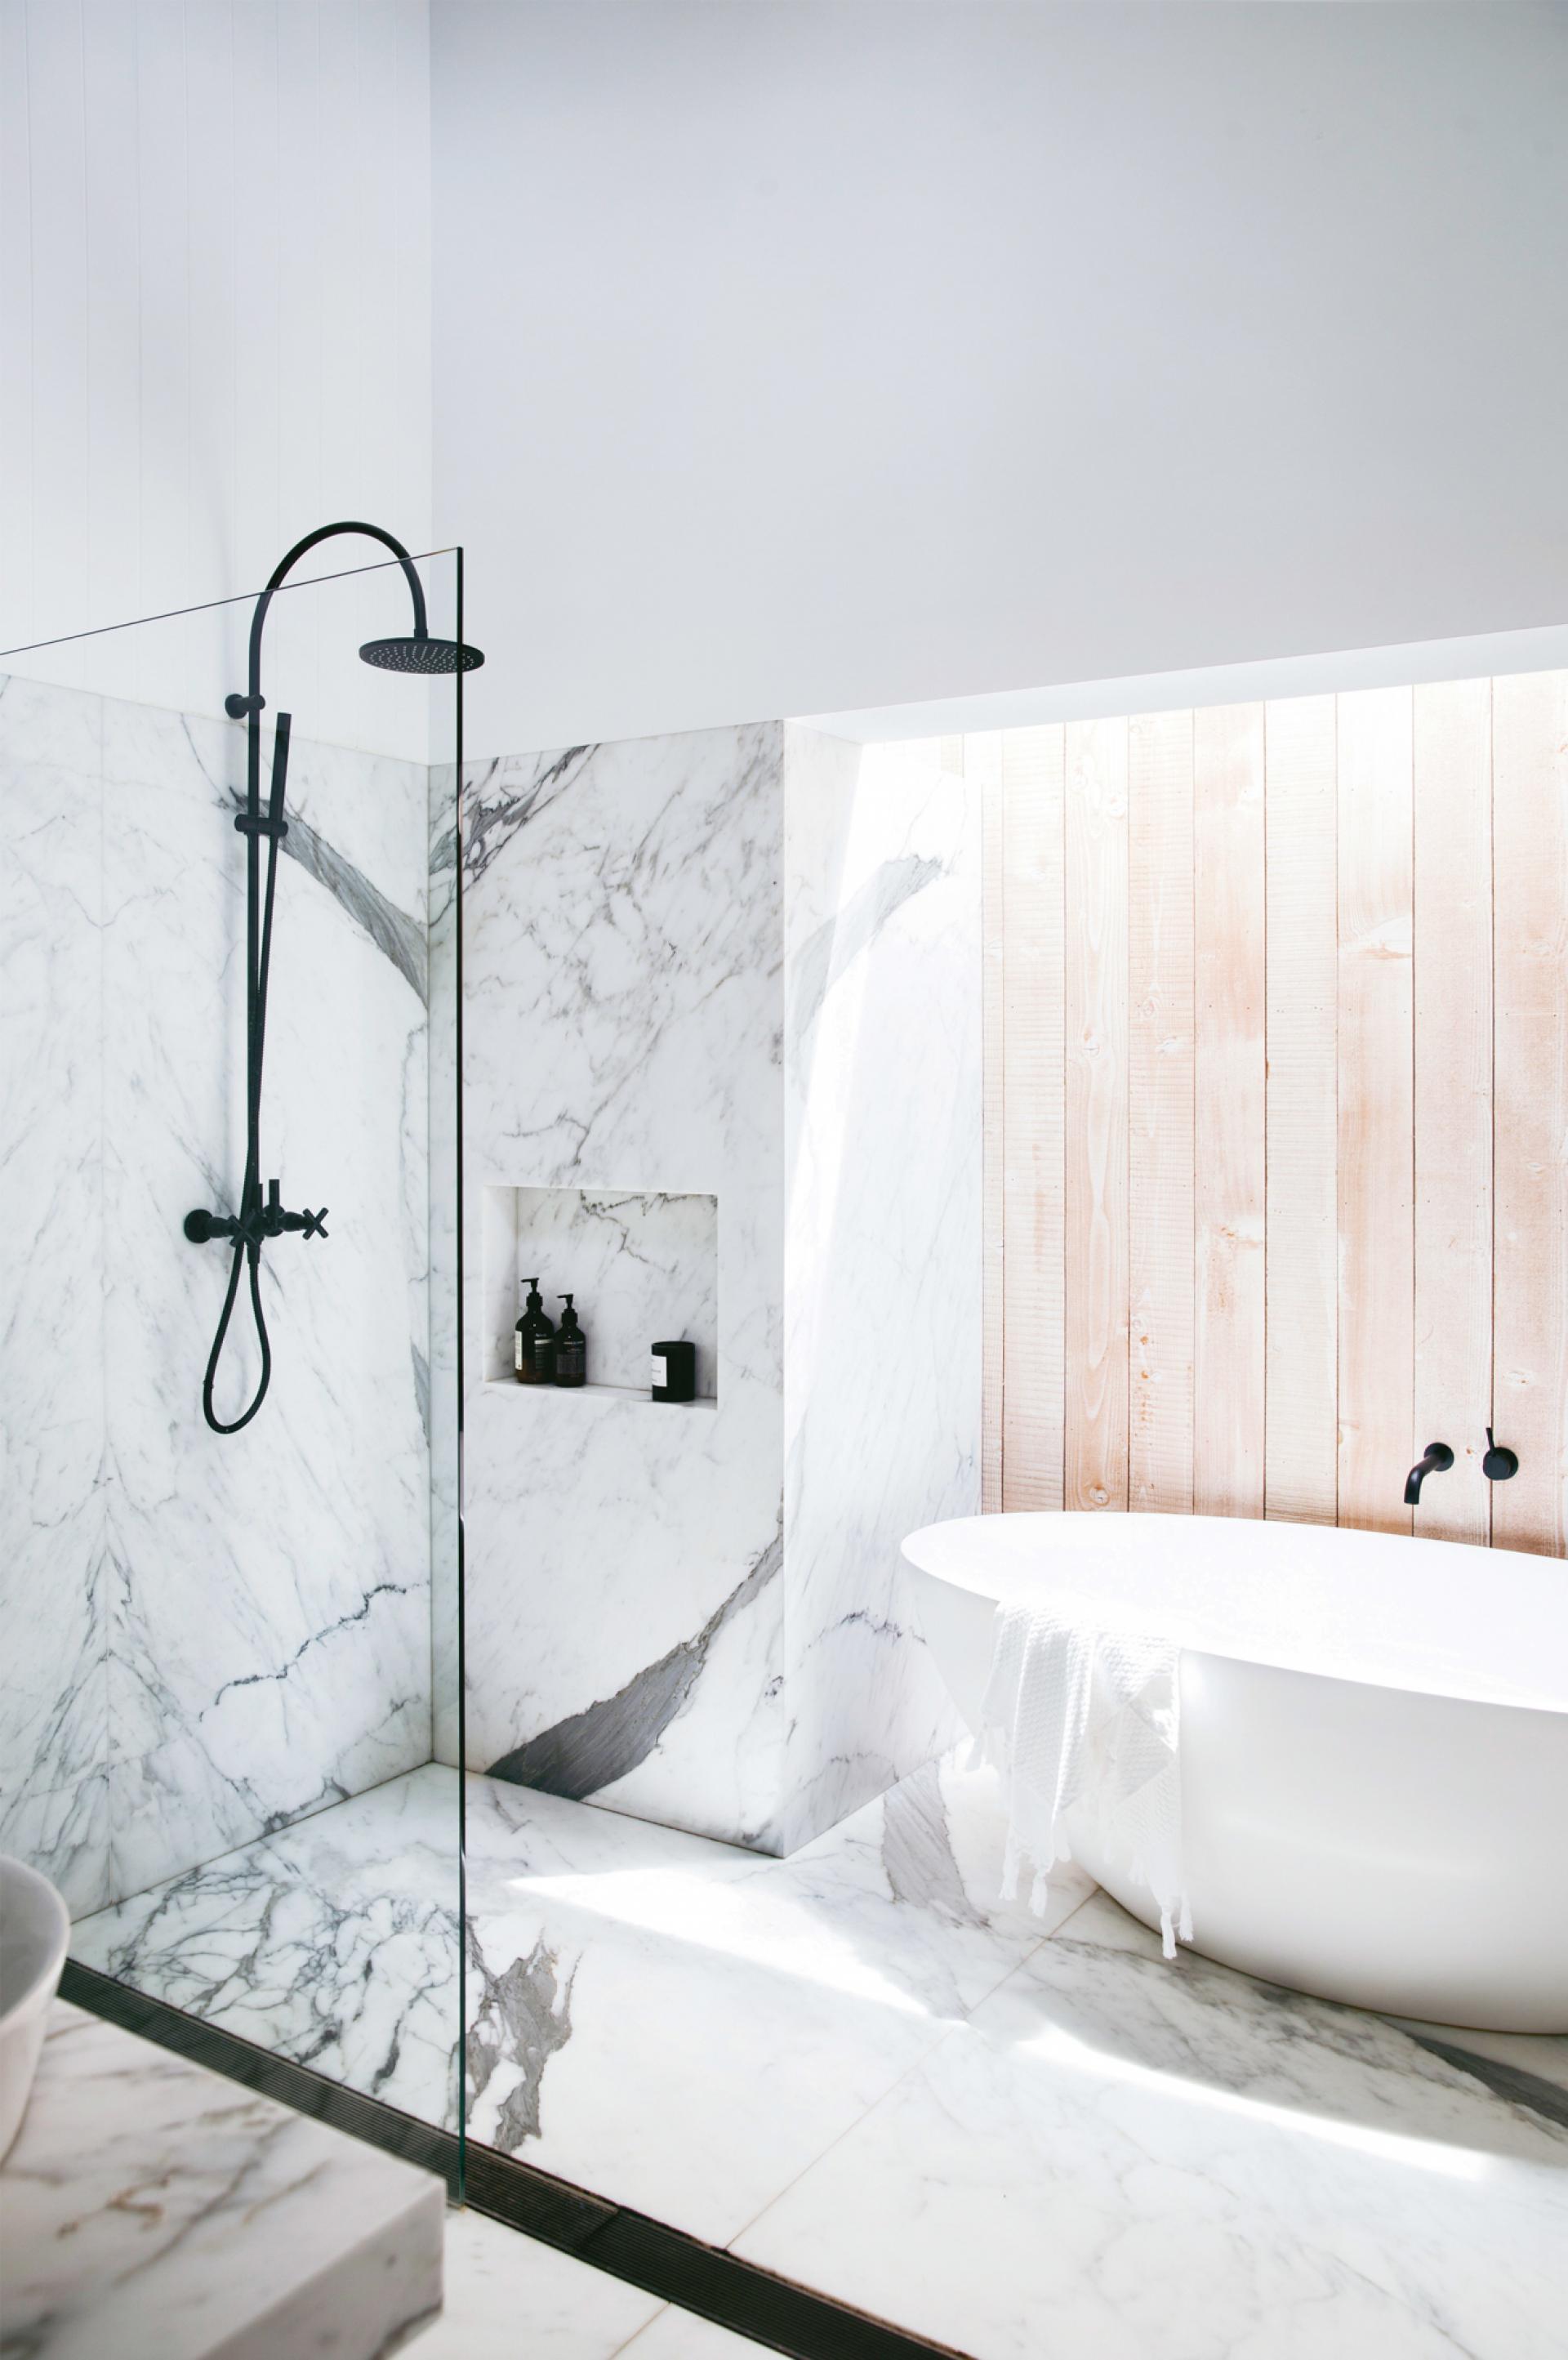 Luxe Badkamer Met Wit Marmer En Zwart Hout Badkamers